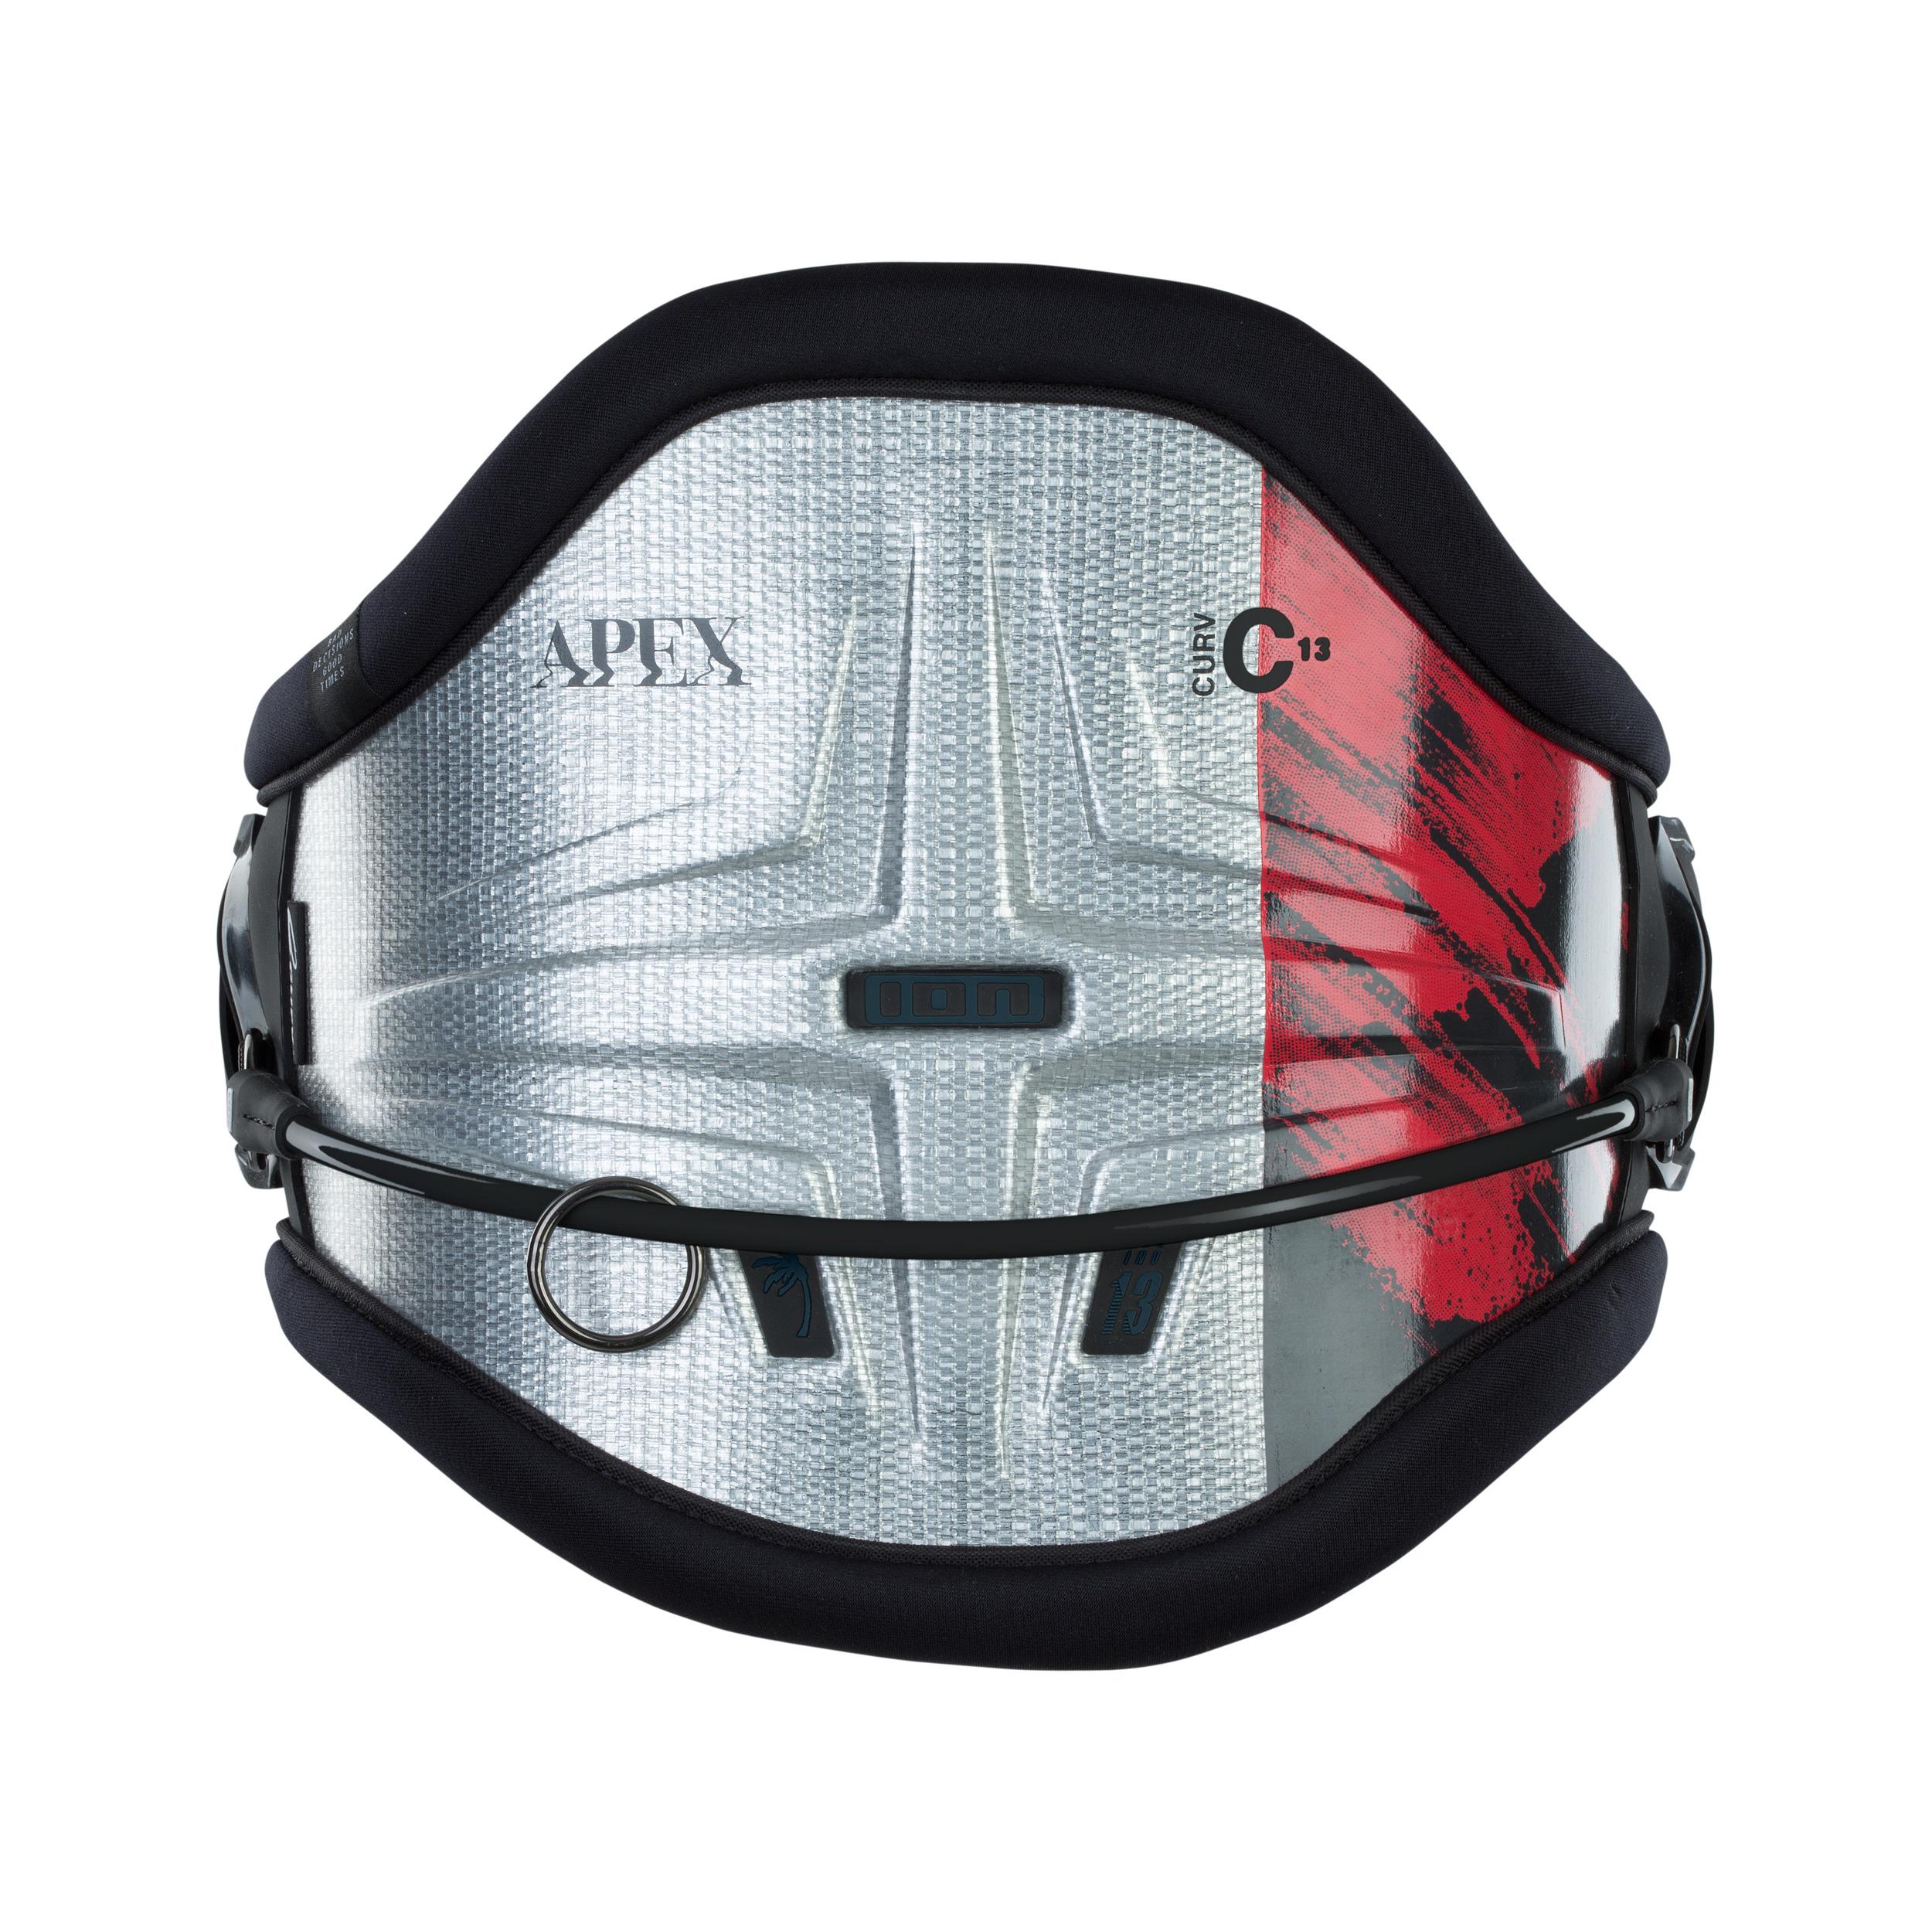 ION APEX Curv 13 2021 Trapez